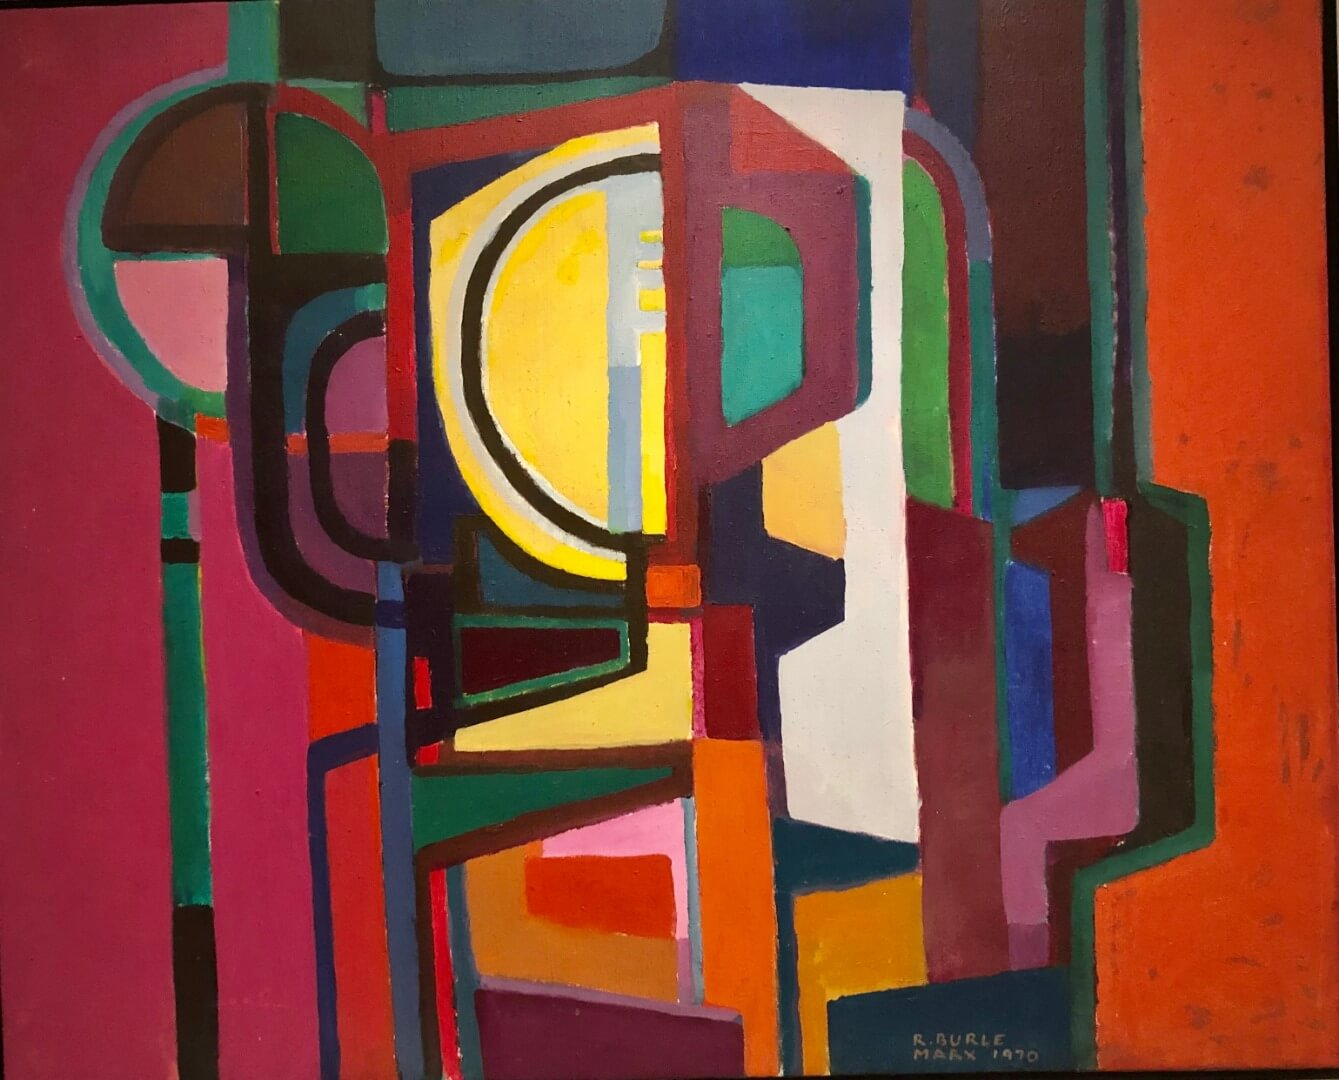 4_Roberto Burle Marx, Untitled, 1970, Acrylic on canvas